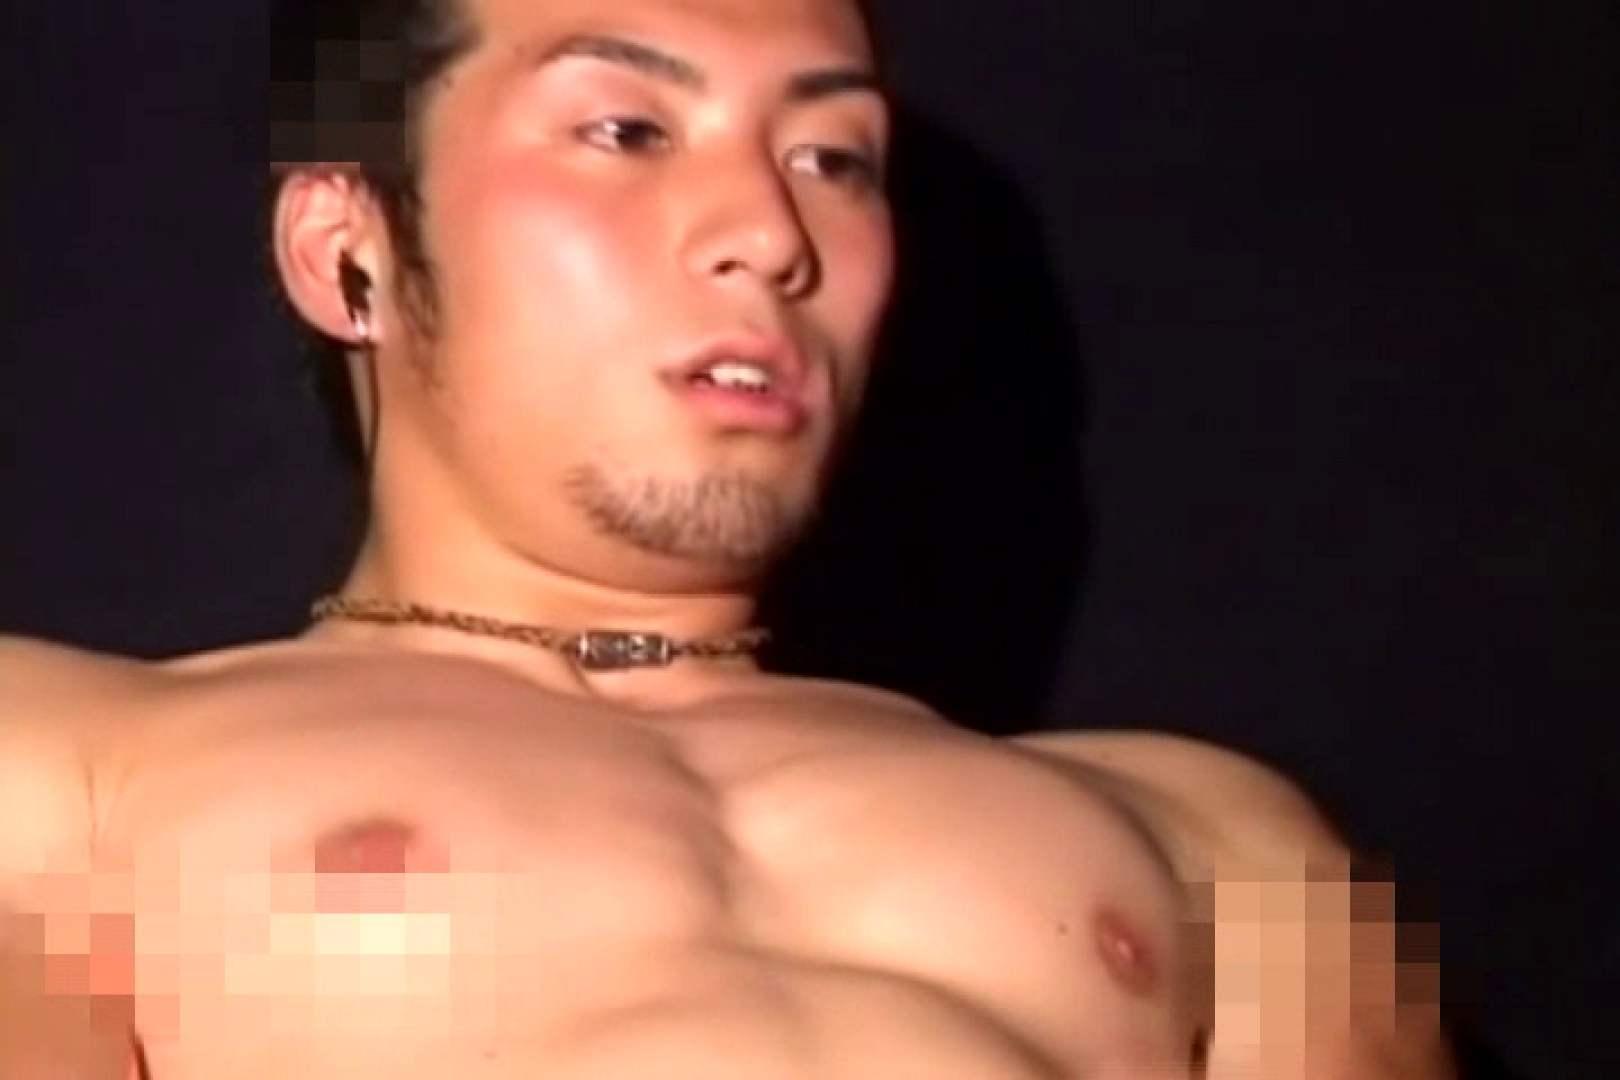 Beautiful muscle モッコリ野郎達!Vol.04 フェラDE絶頂 | イケメンのsex  103pic 45